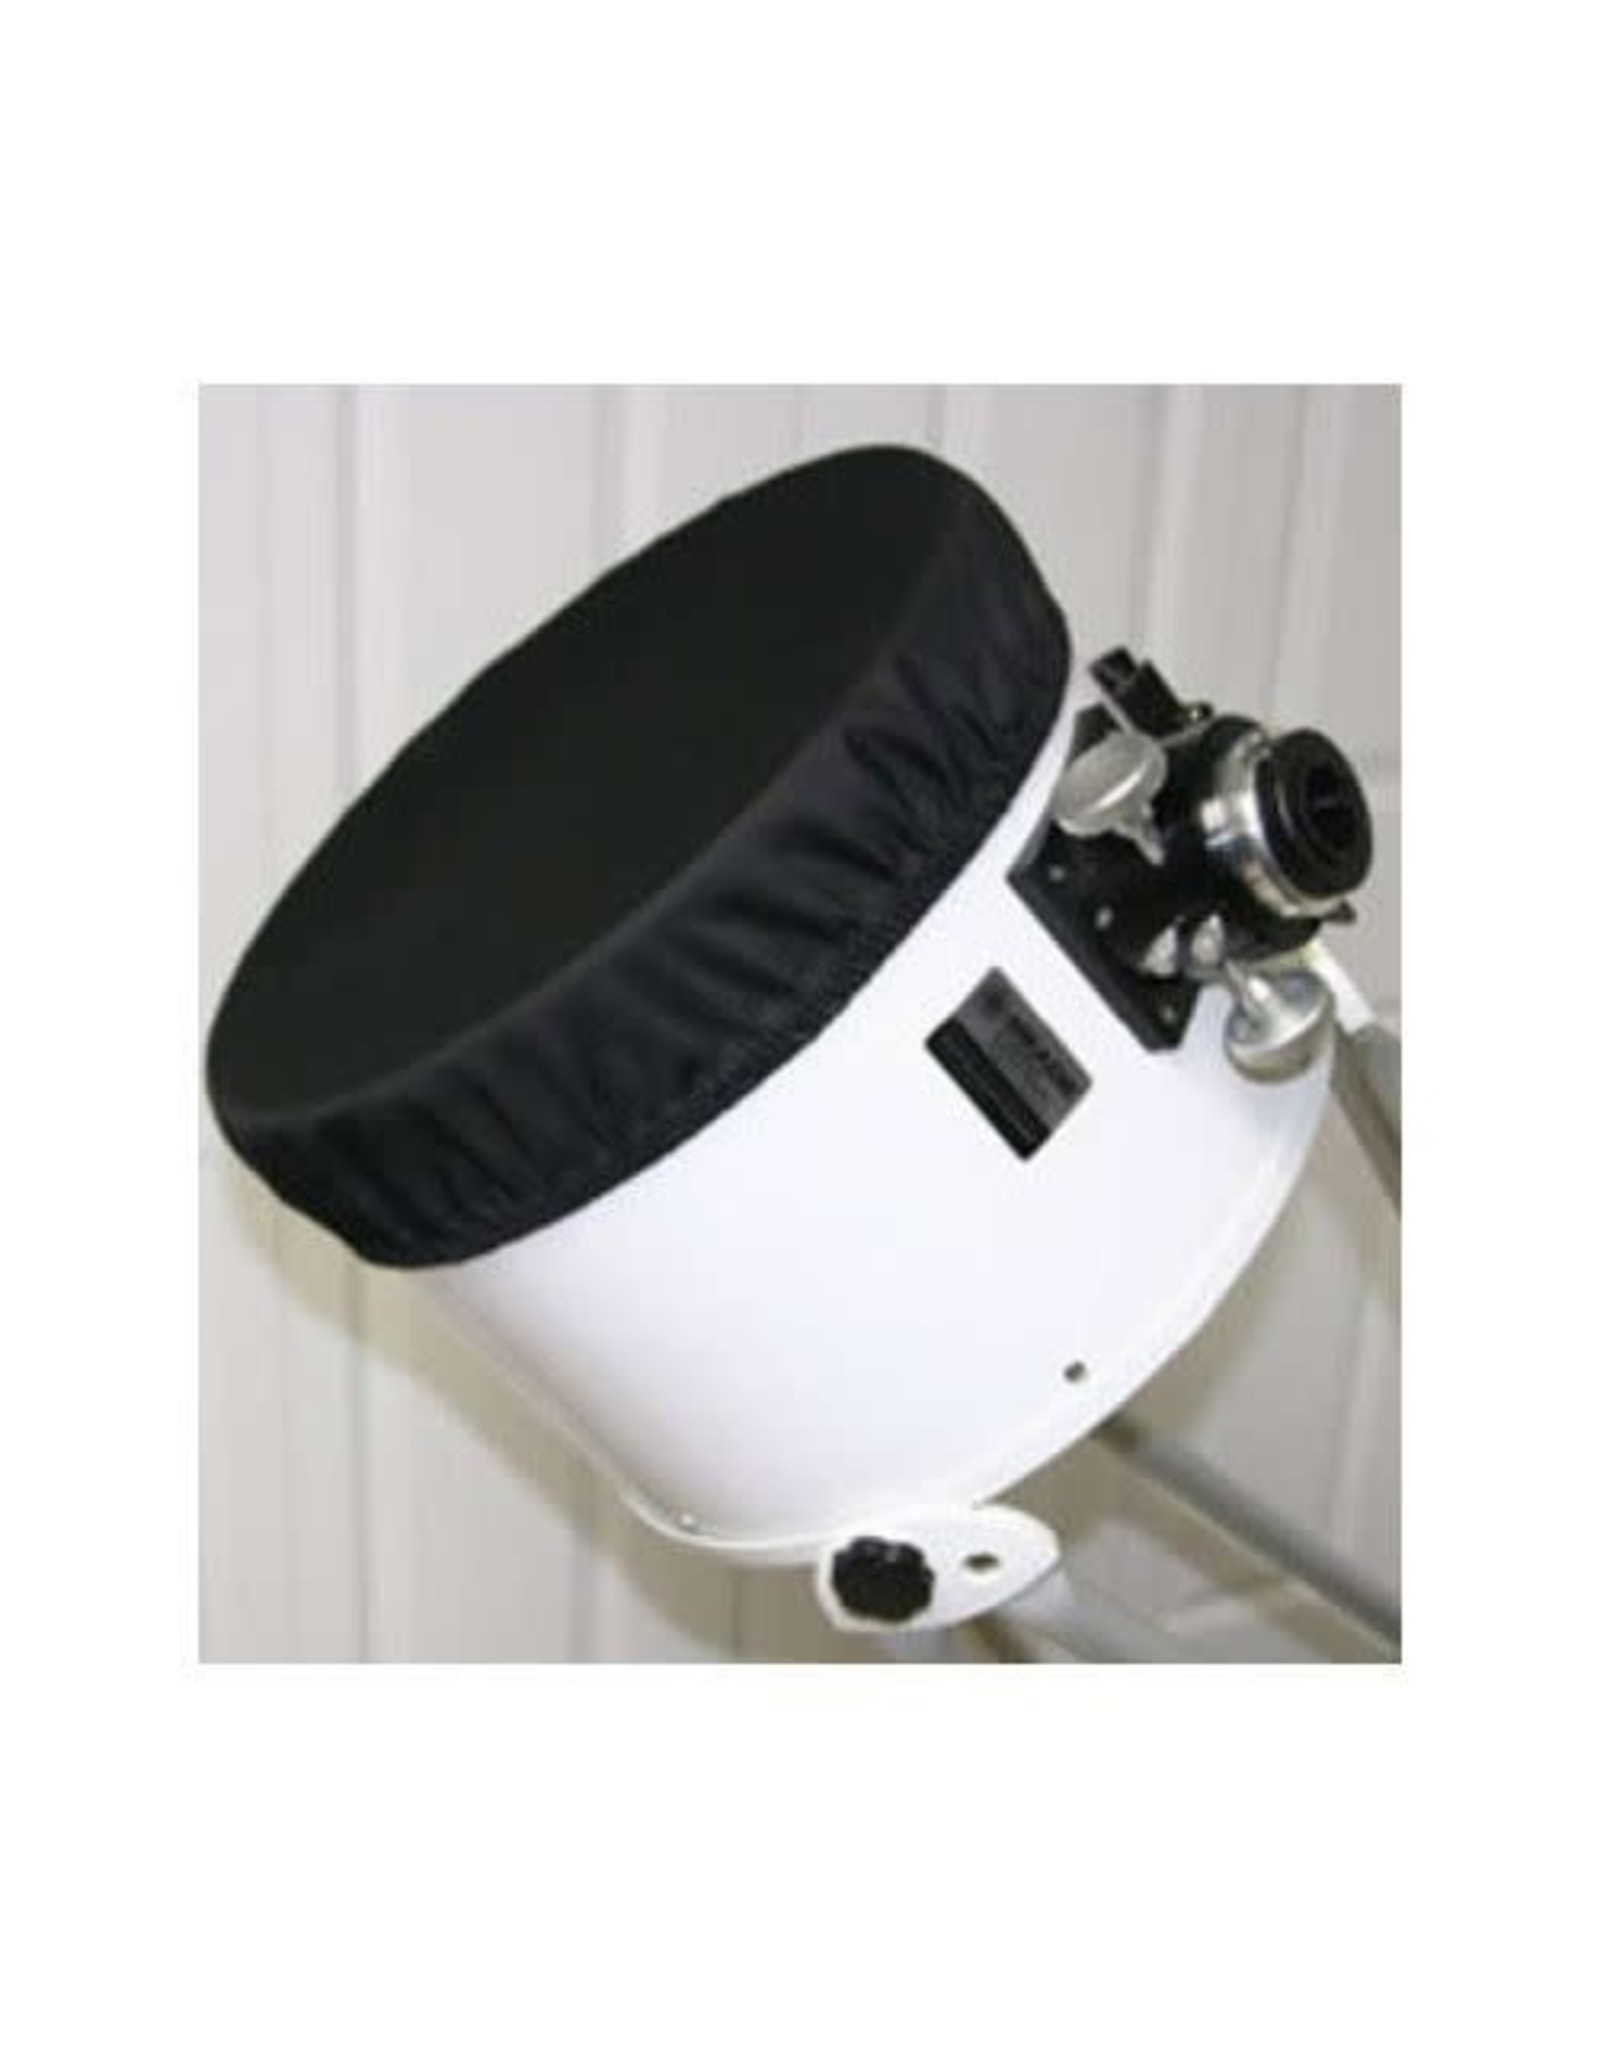 "Astrozap AstroZap 8"" Dobsonian Dust Cover - 10"" Diameter - AZ1401"